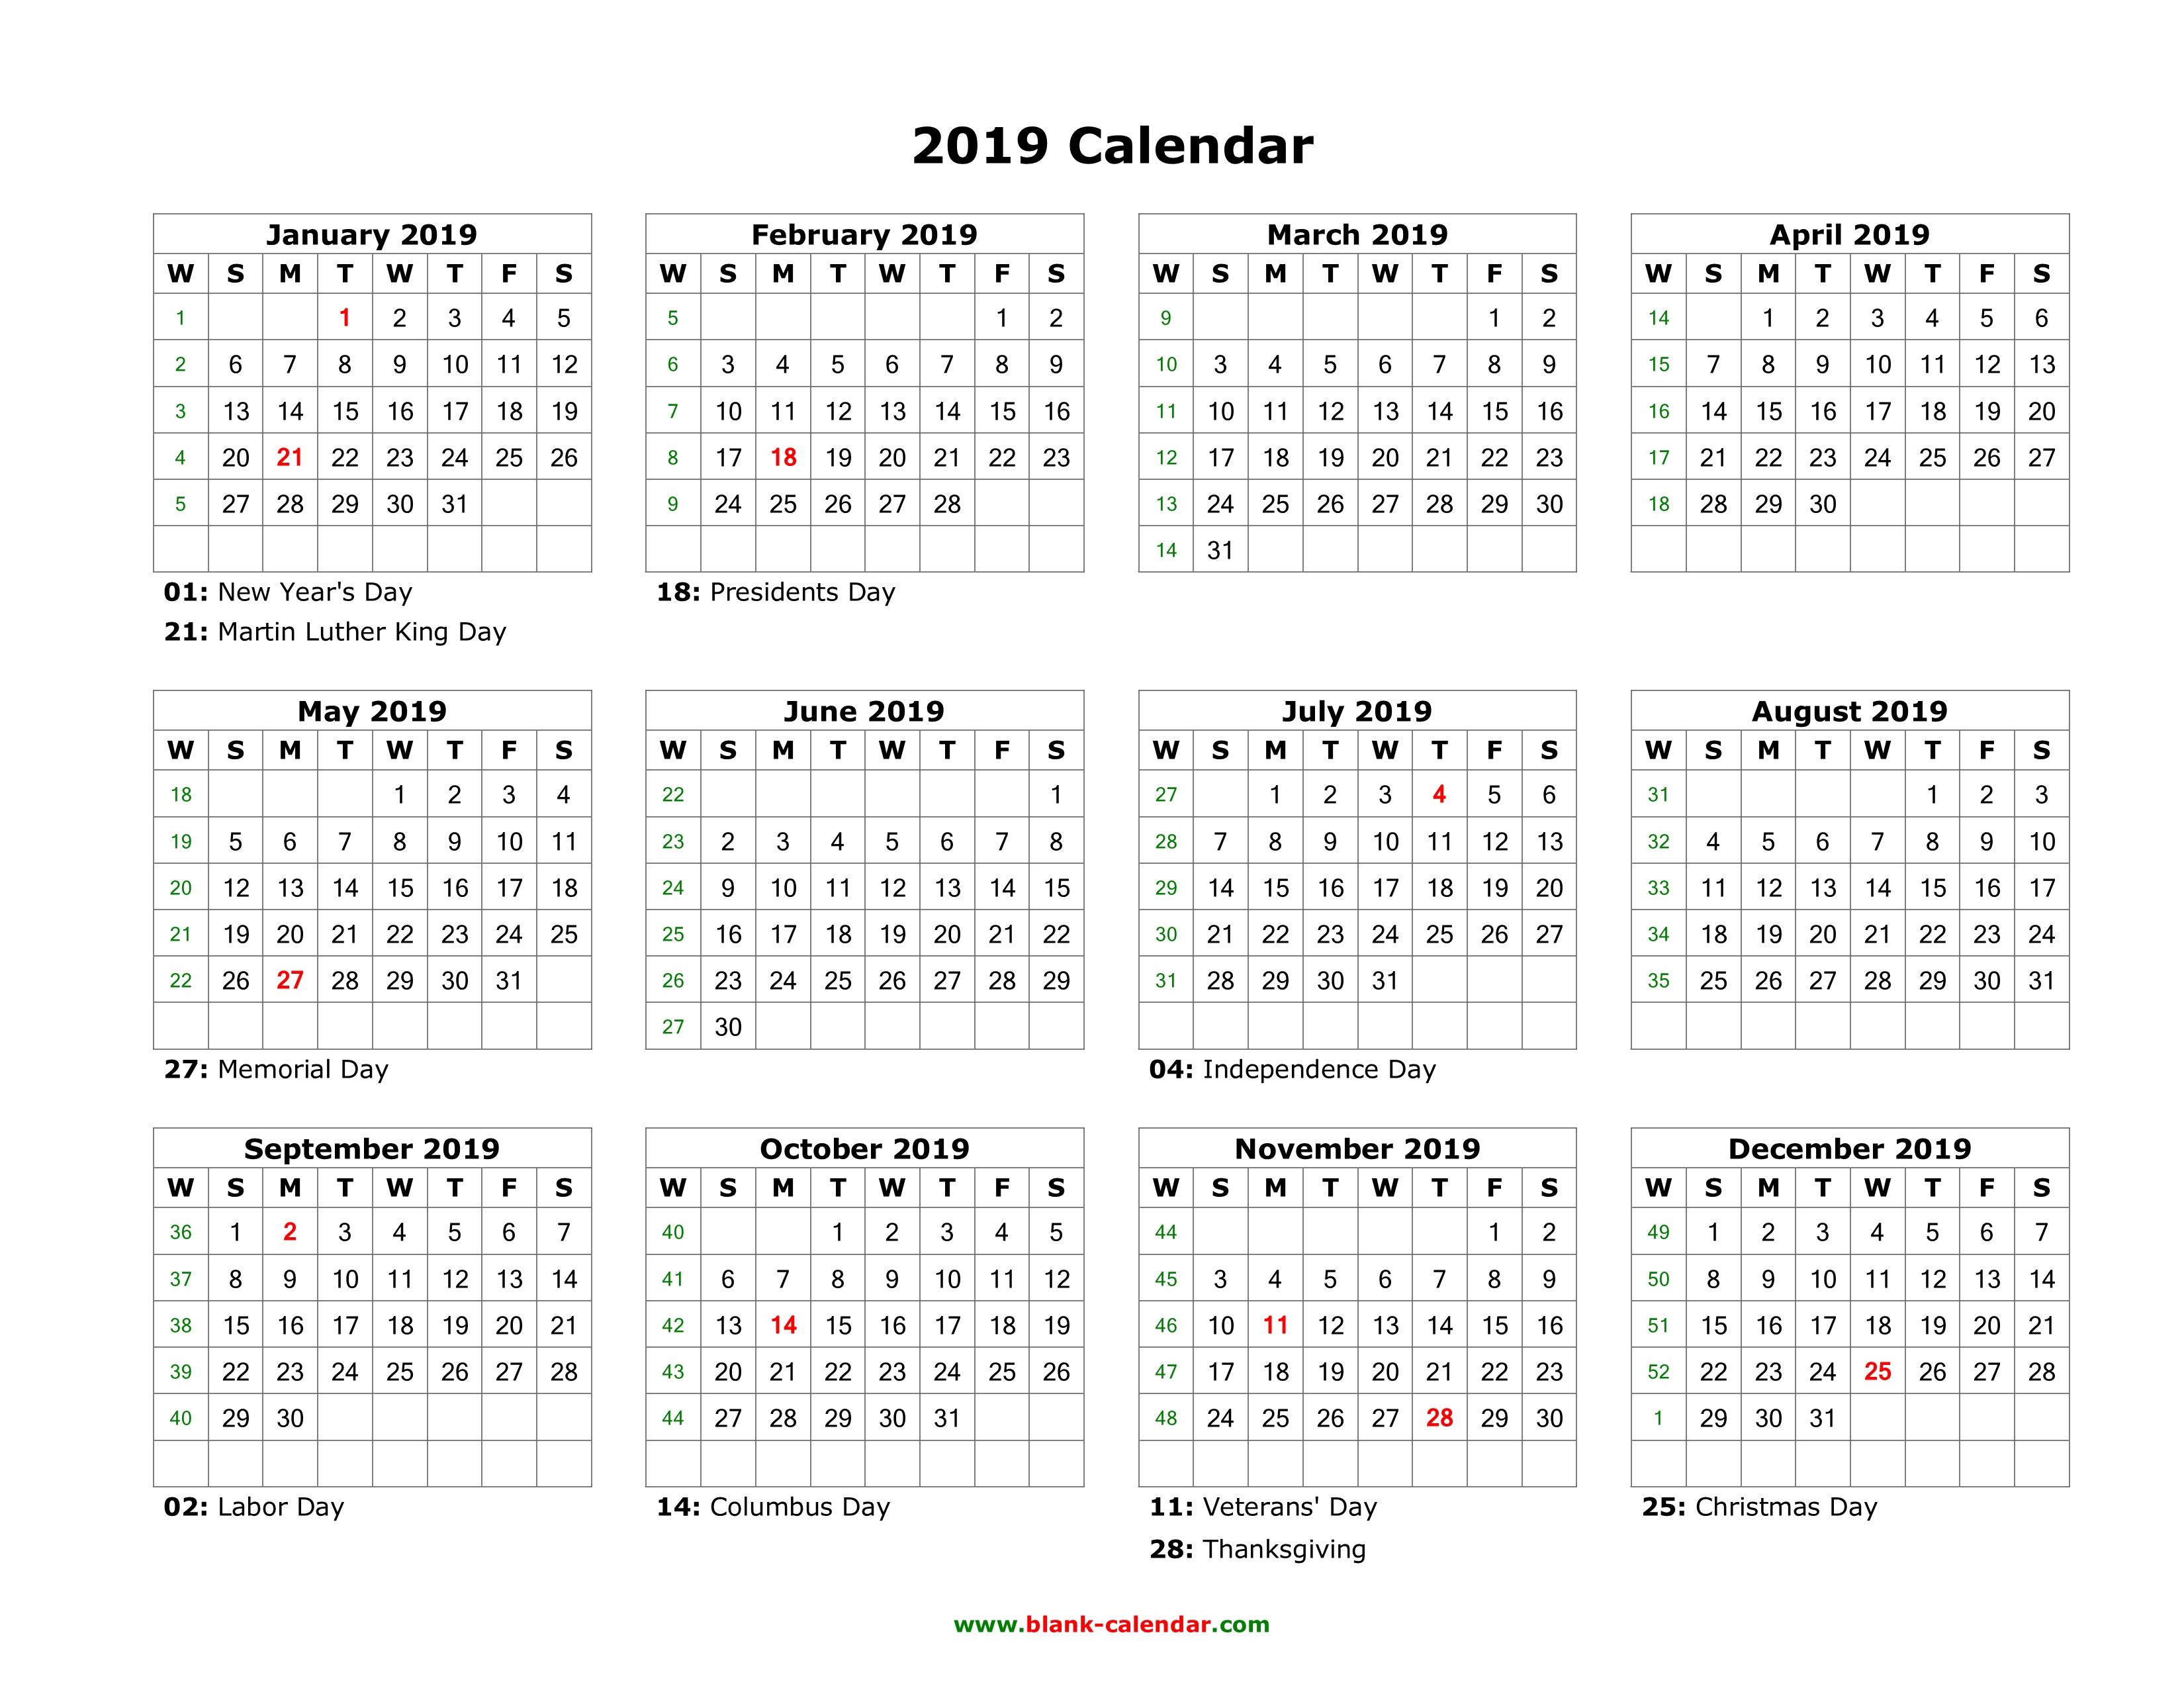 Year Calendar Horizontal : Download blank calendar with us holidays months